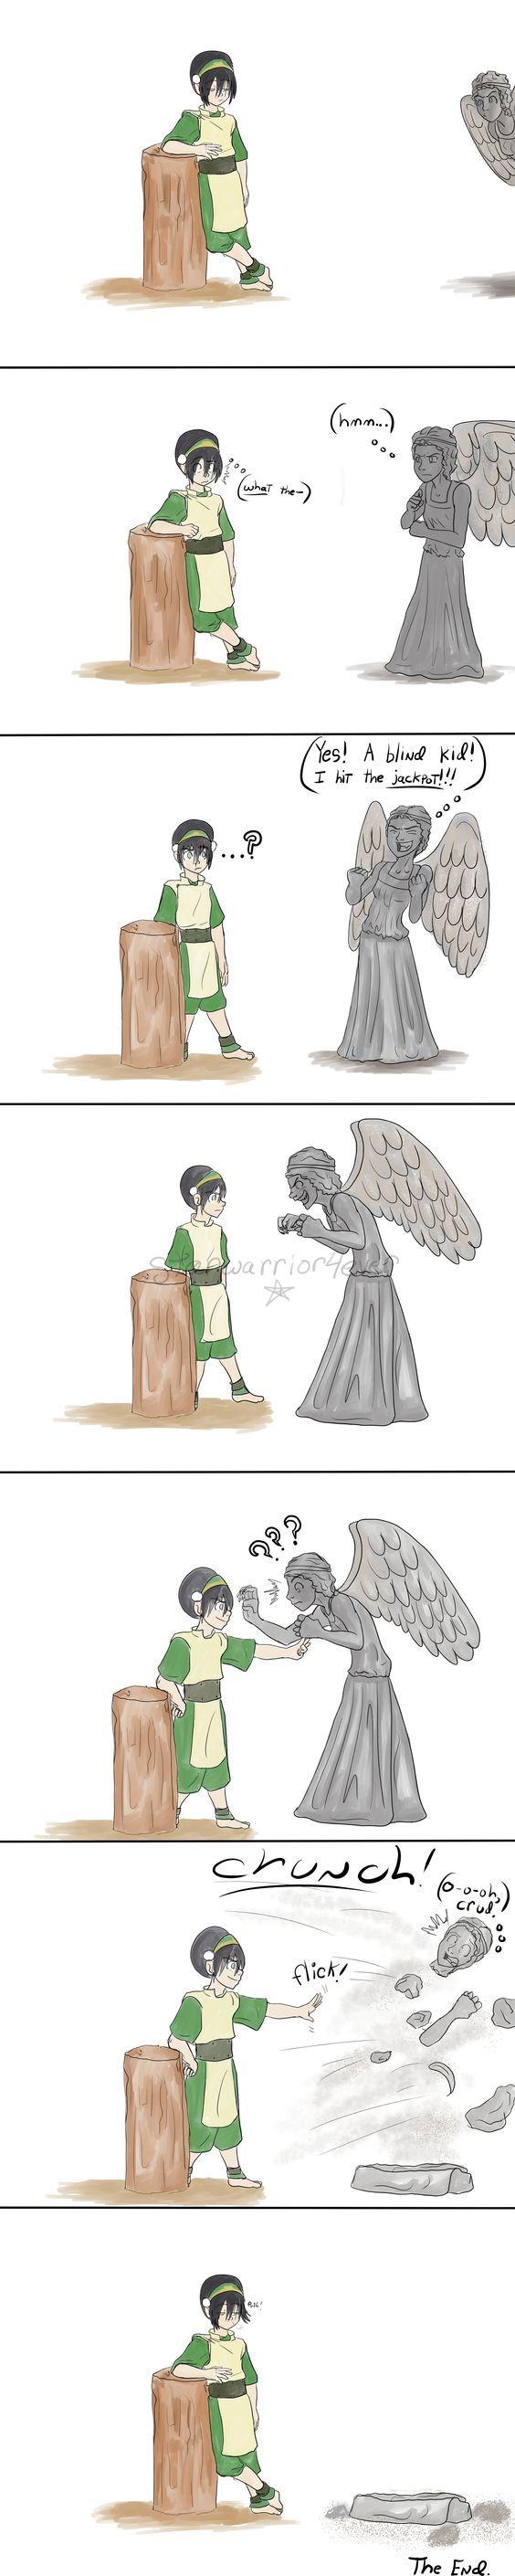 Toph vs a Weeping Angel